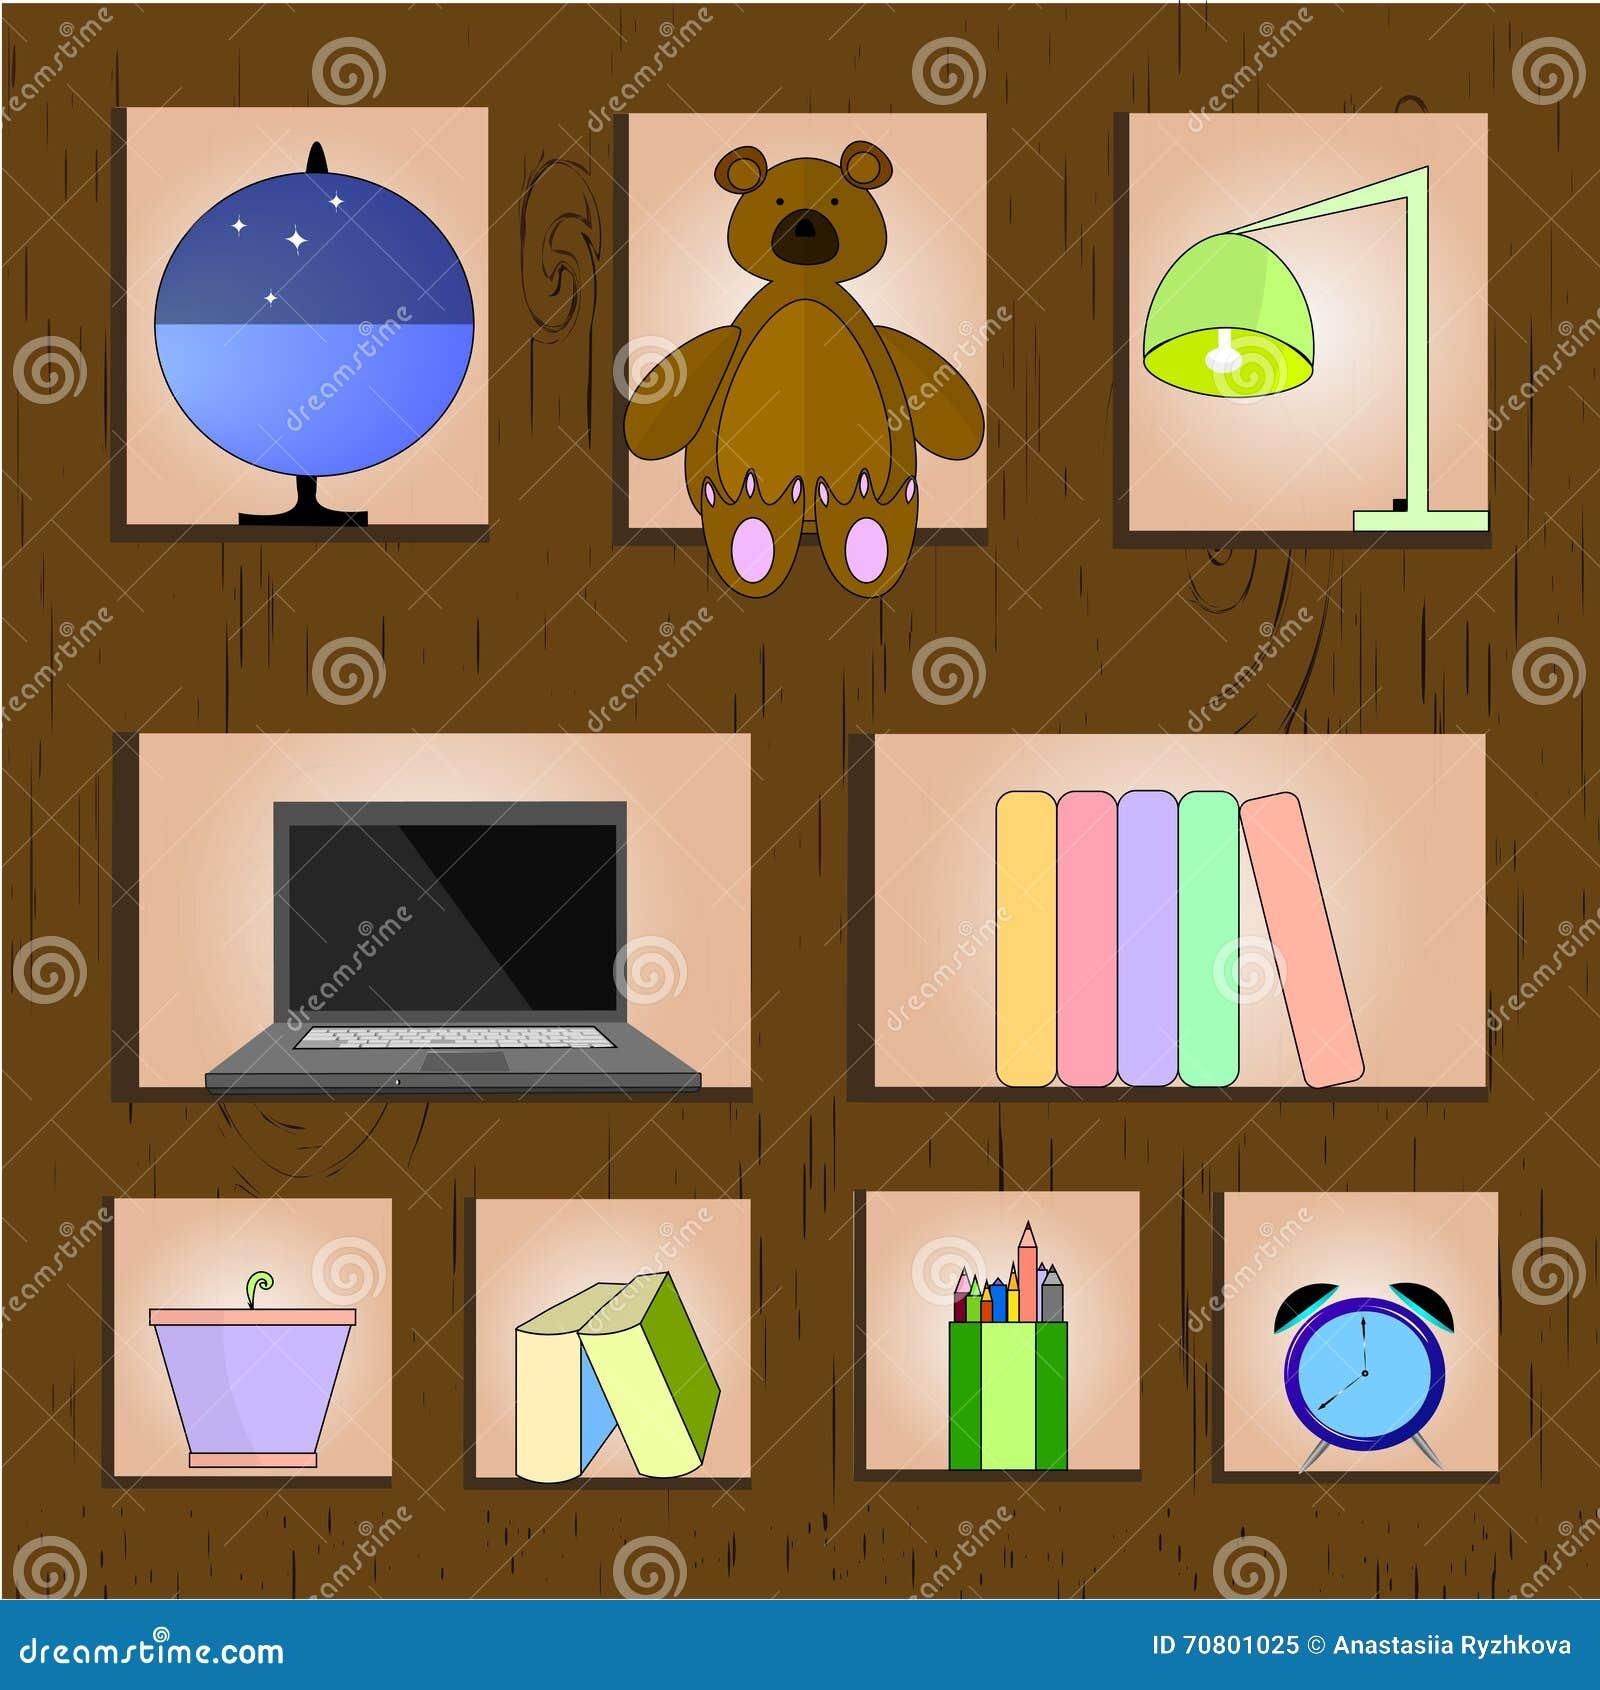 Wooden Shelf Vector Illustration Home Related Stuff On Background